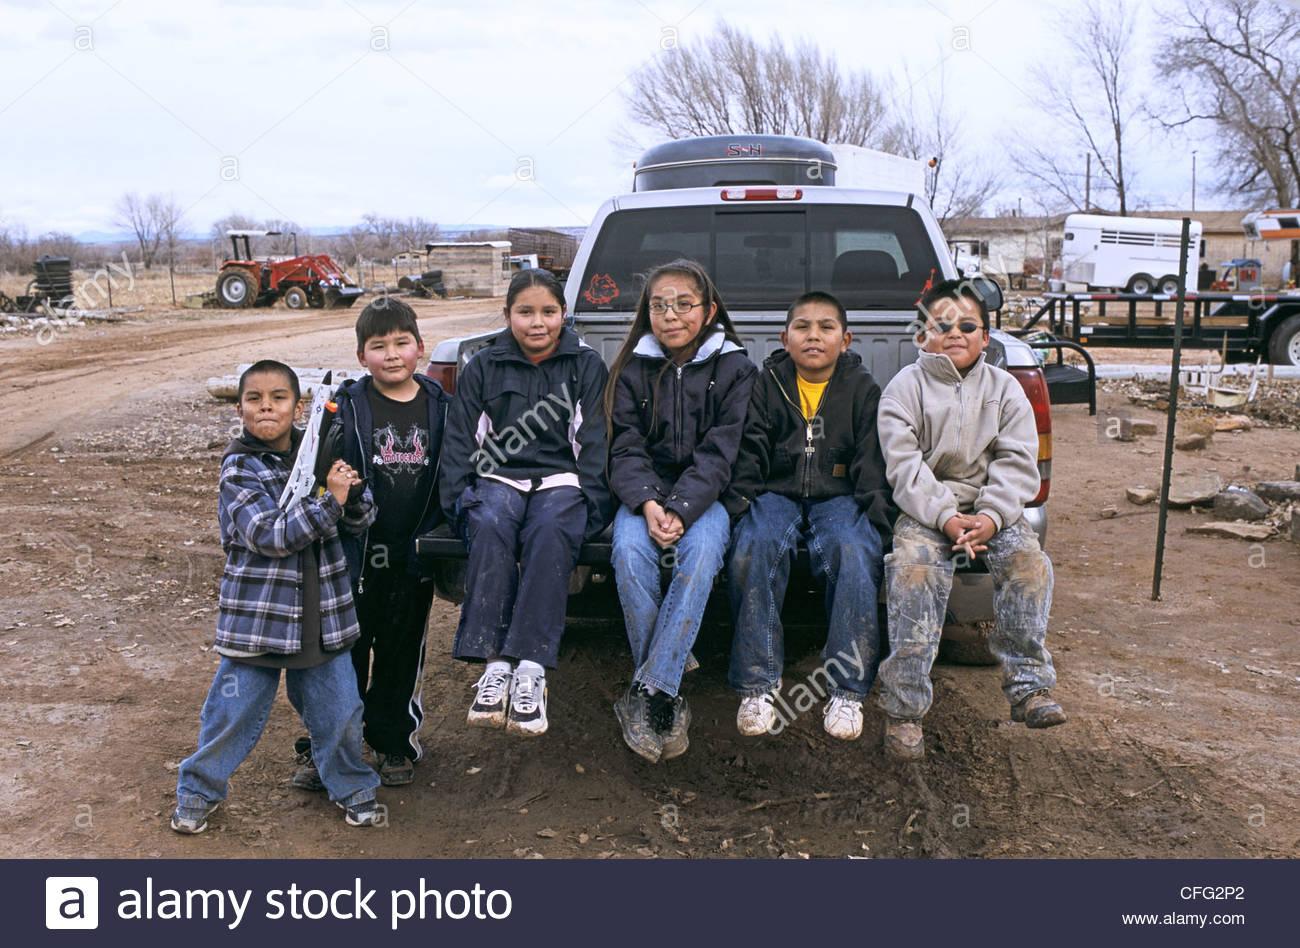 Navajo children at a Navajo indian reservation. - Stock Image